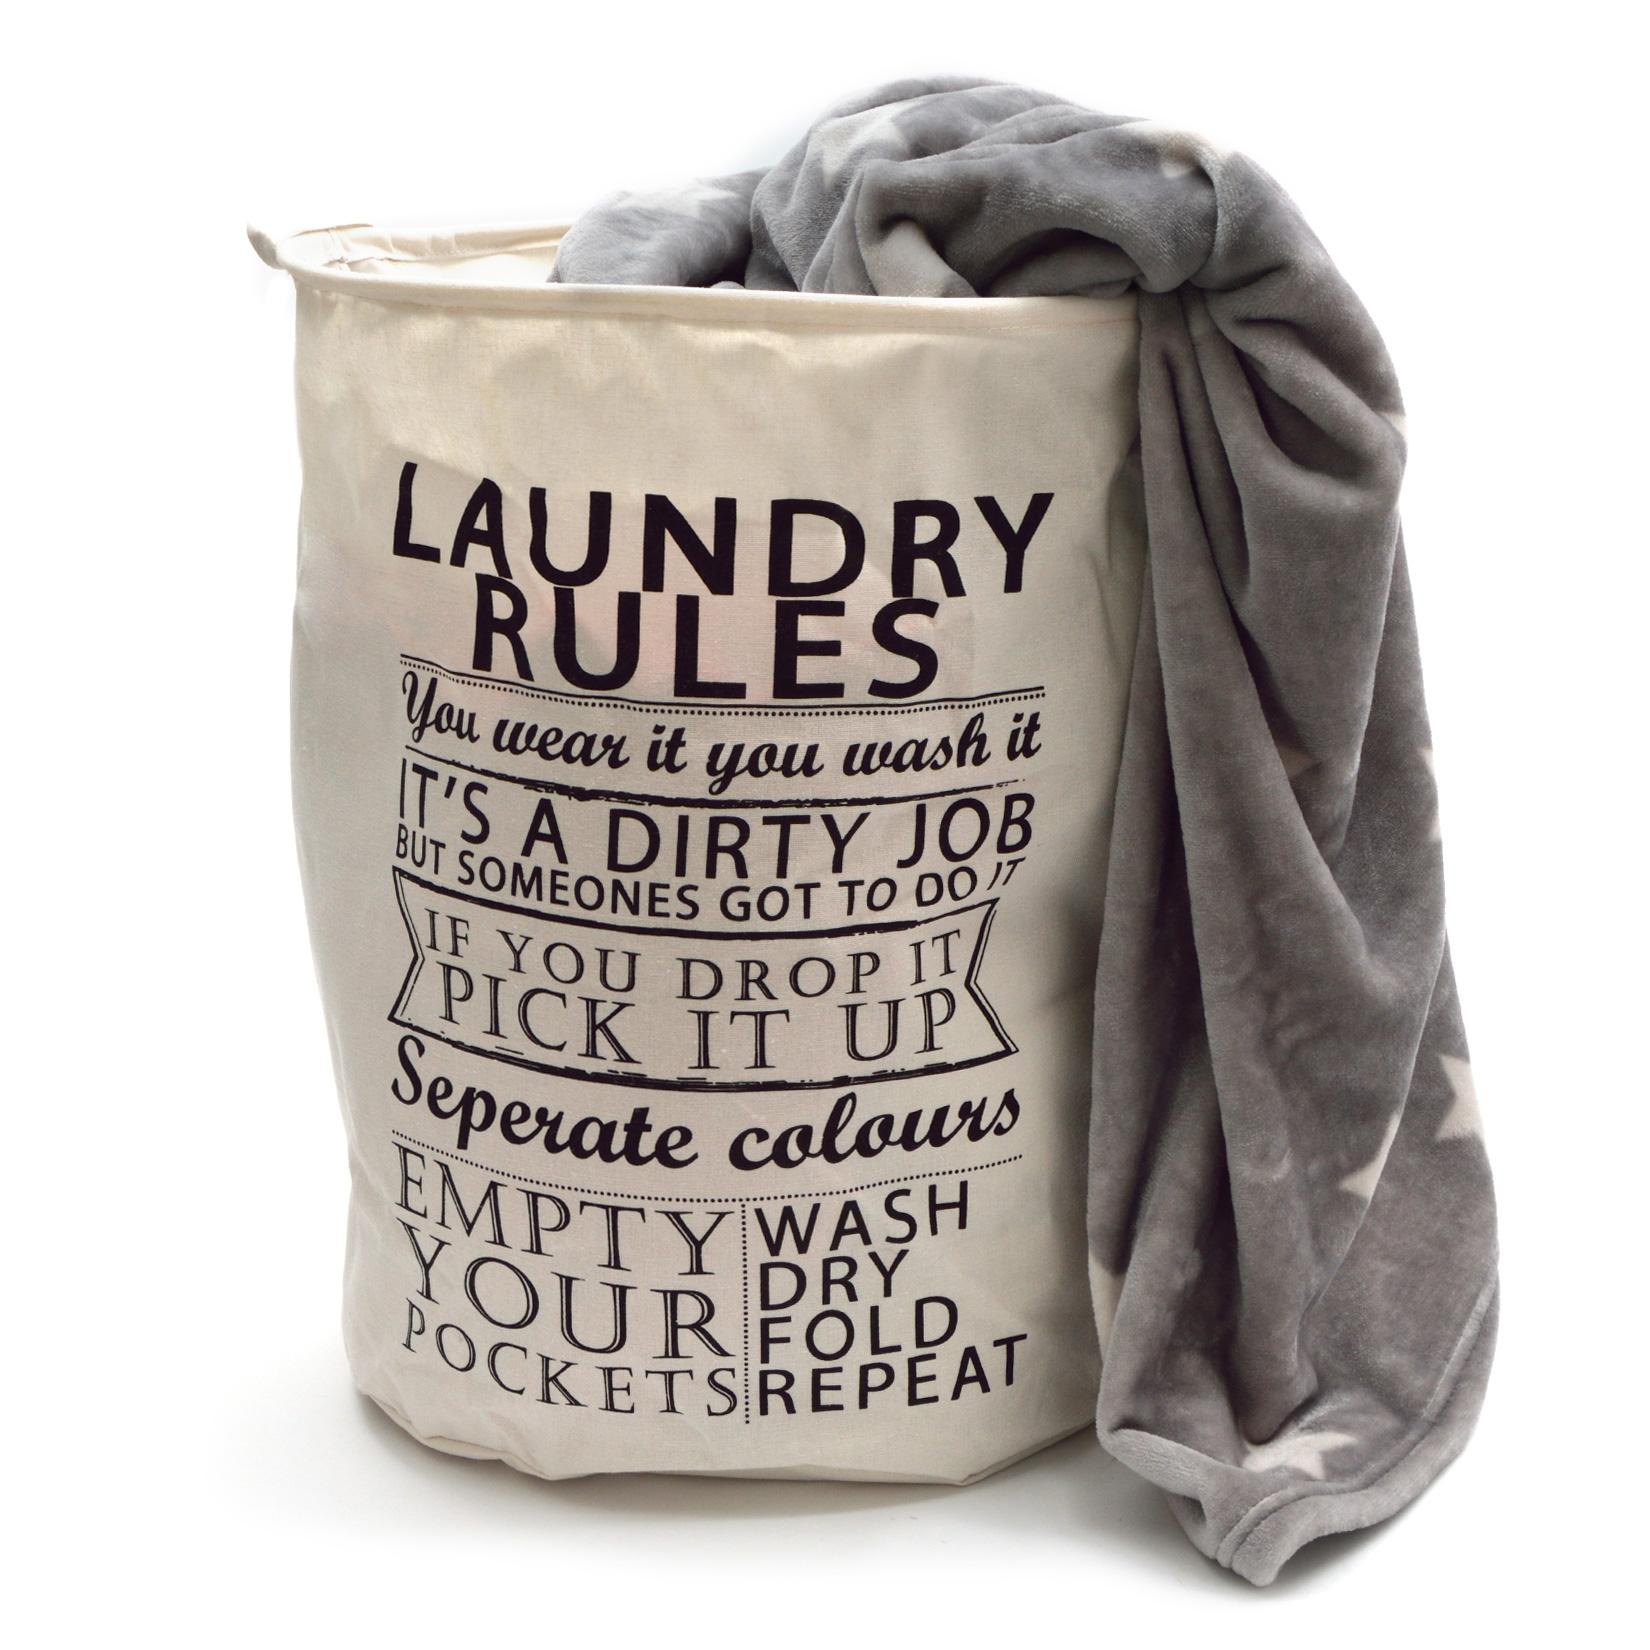 SV129-W Pink Papaya Wäschesack Laundry Rules - WEISS/SCHWARZ H:50 x Ø 40 cm